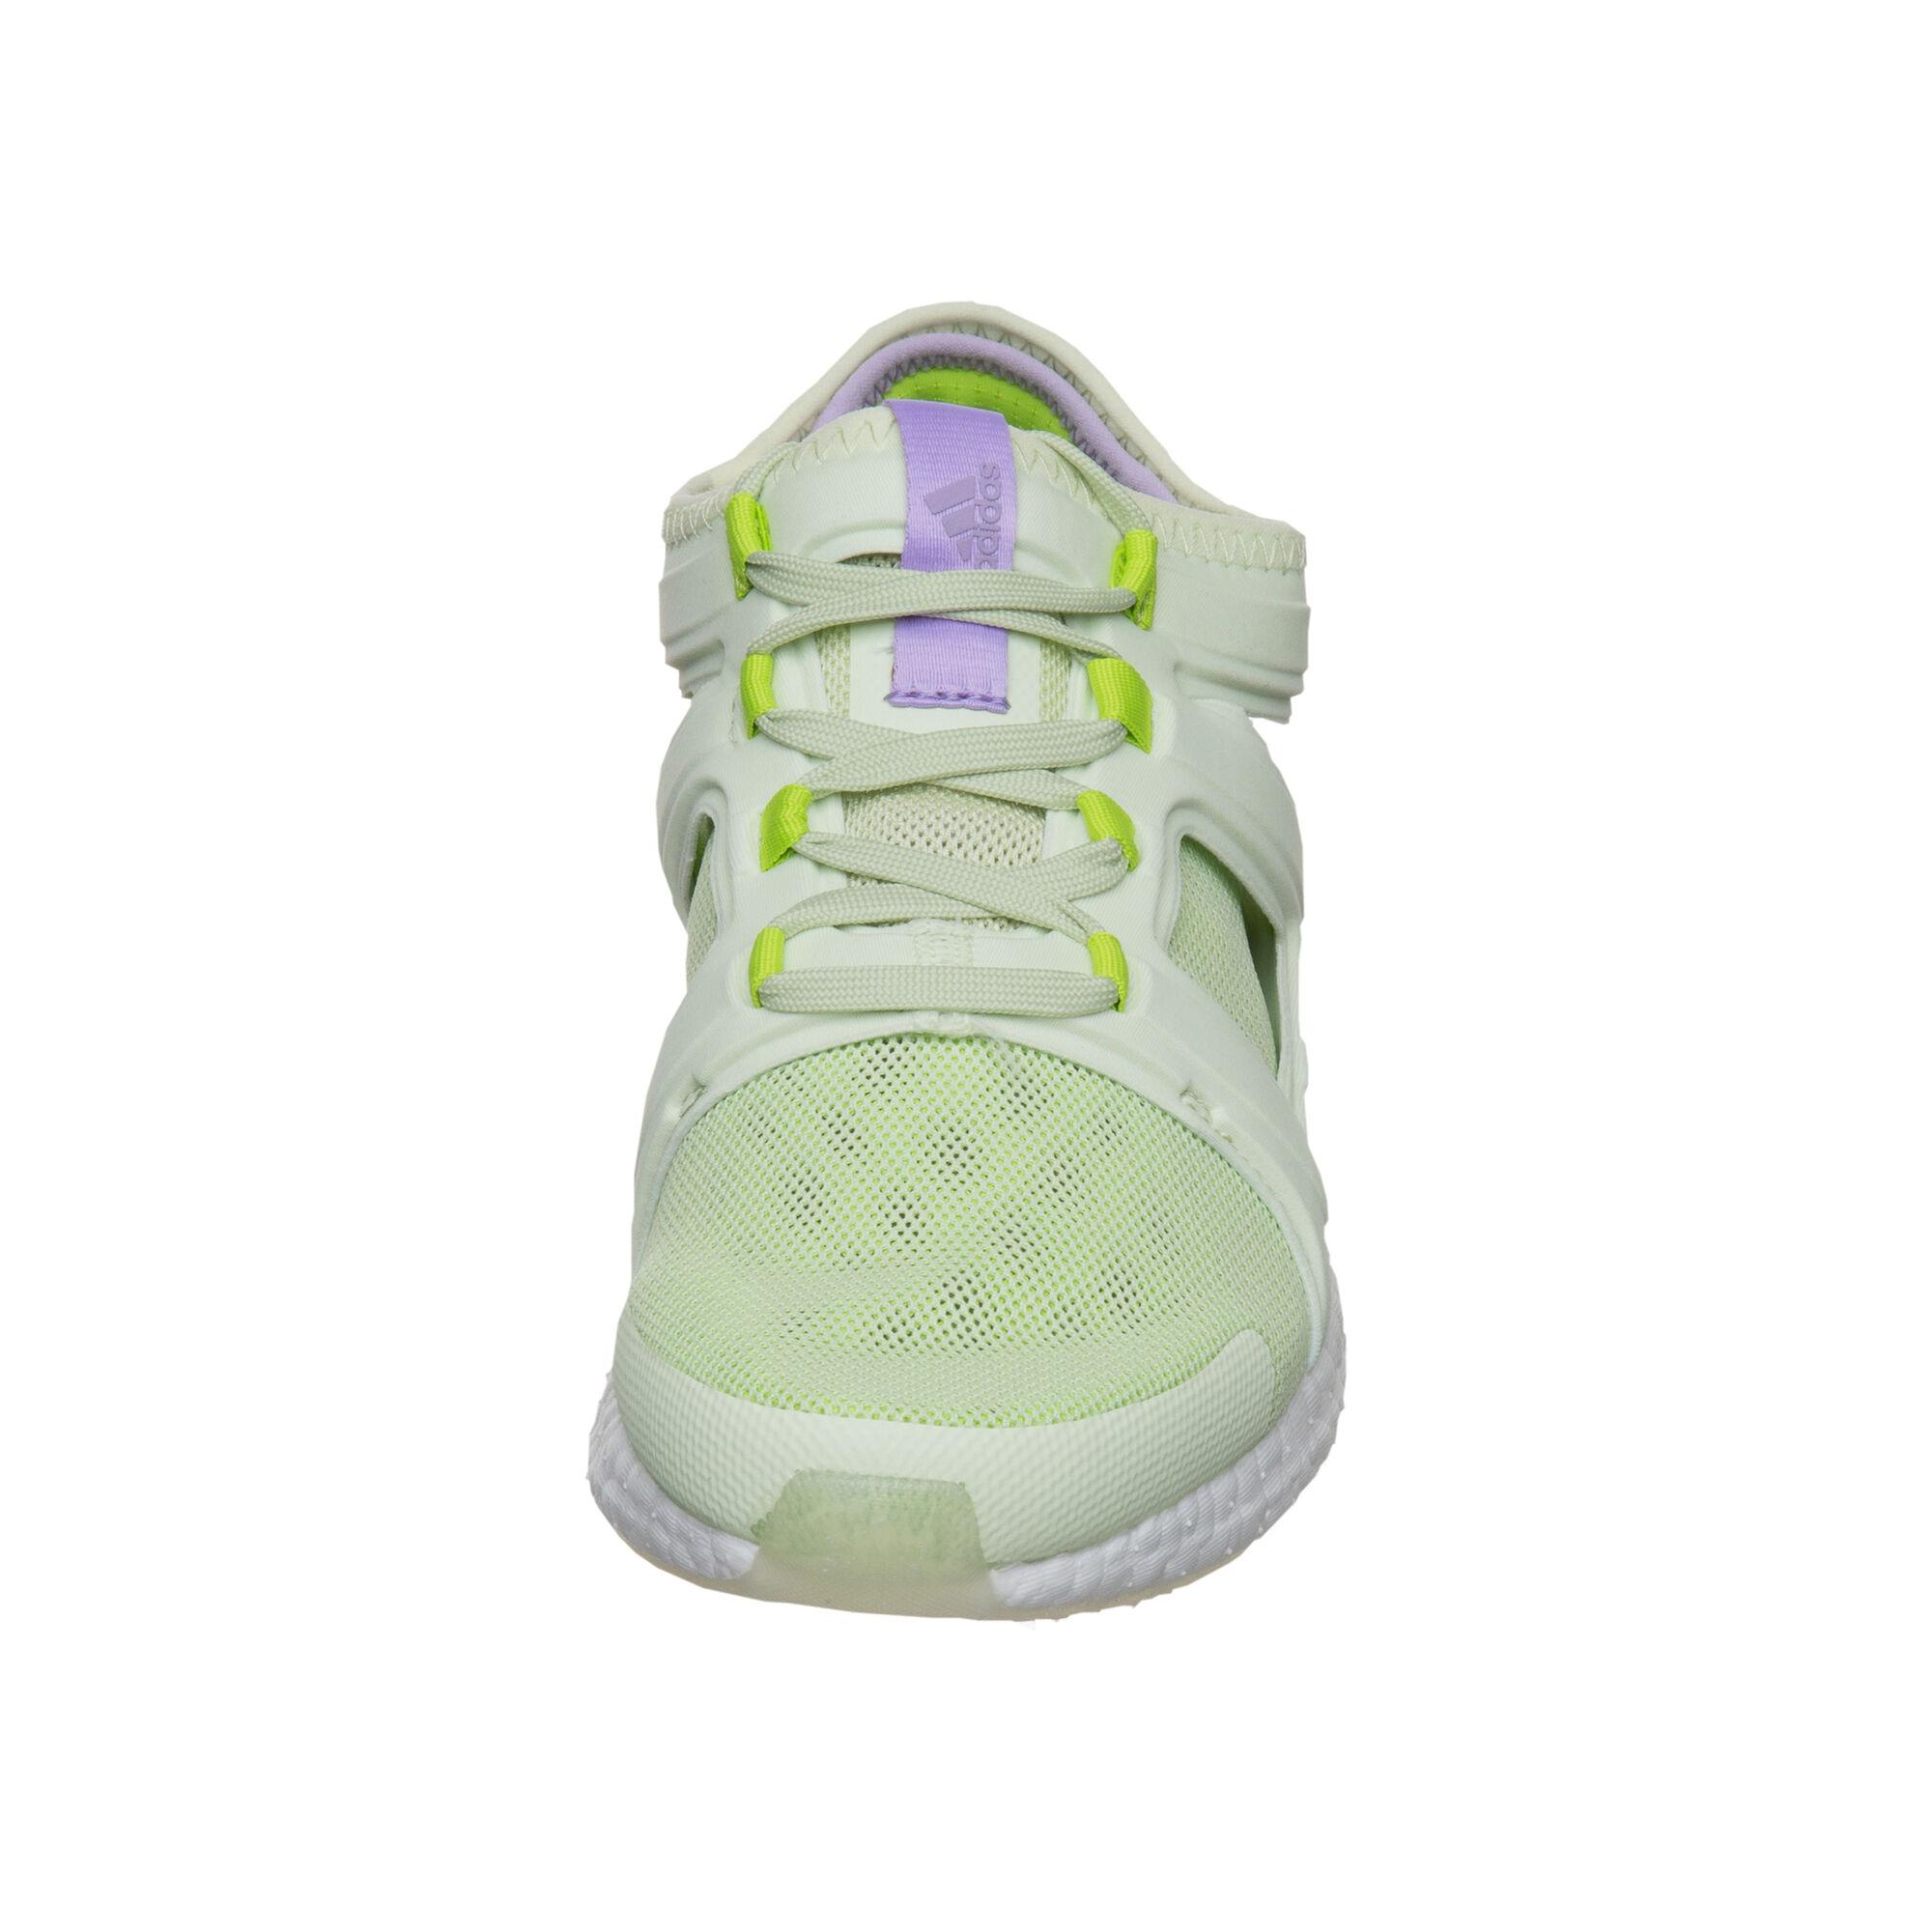 timeless design 3e7cf 81b96 ... adidas adidas adidas adidas. CC Rocket Boost ...